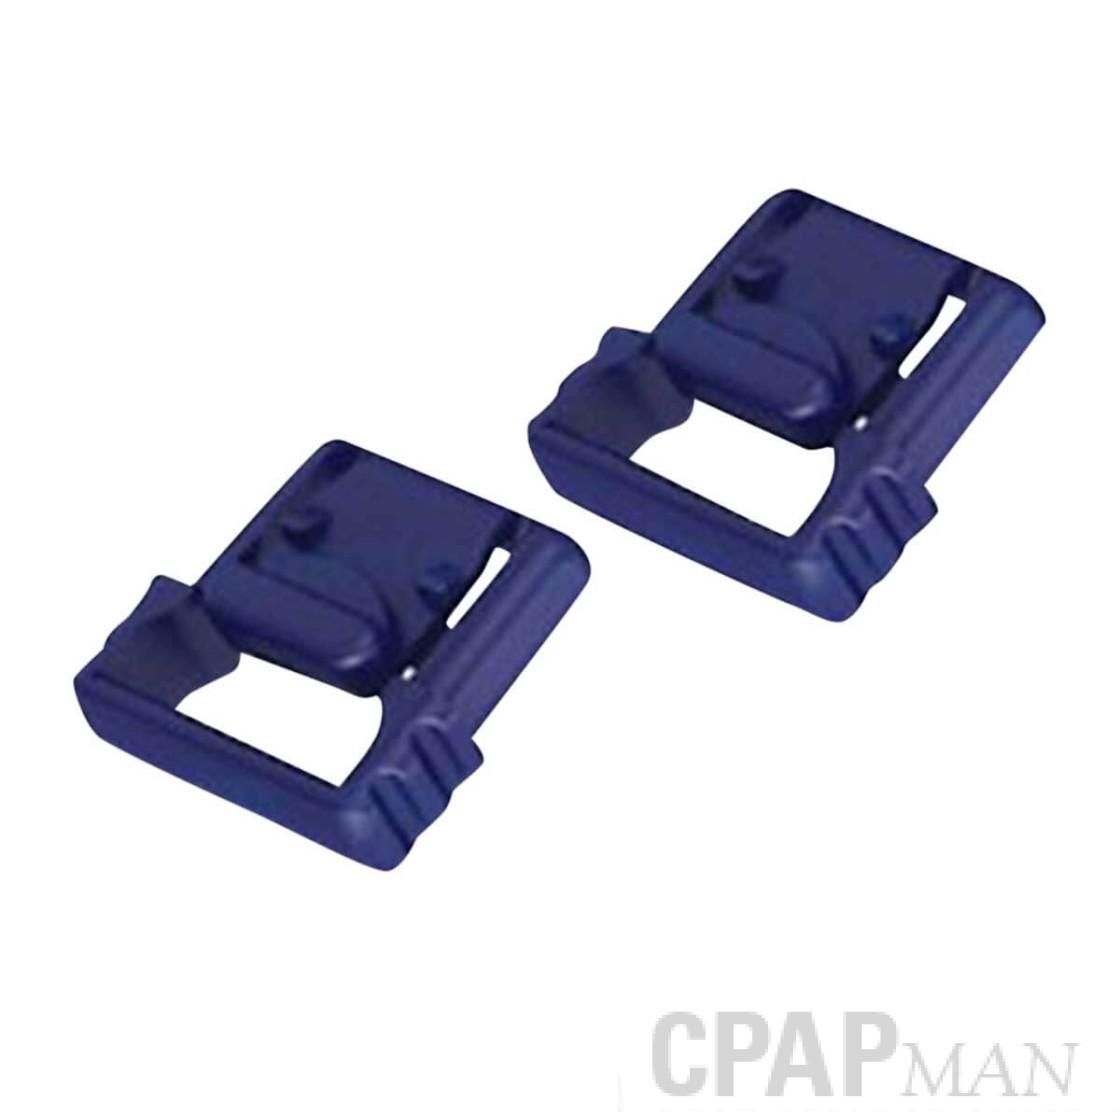 Headgear Clips for ResMed LT/SoftGel/UM II/Micro Masks